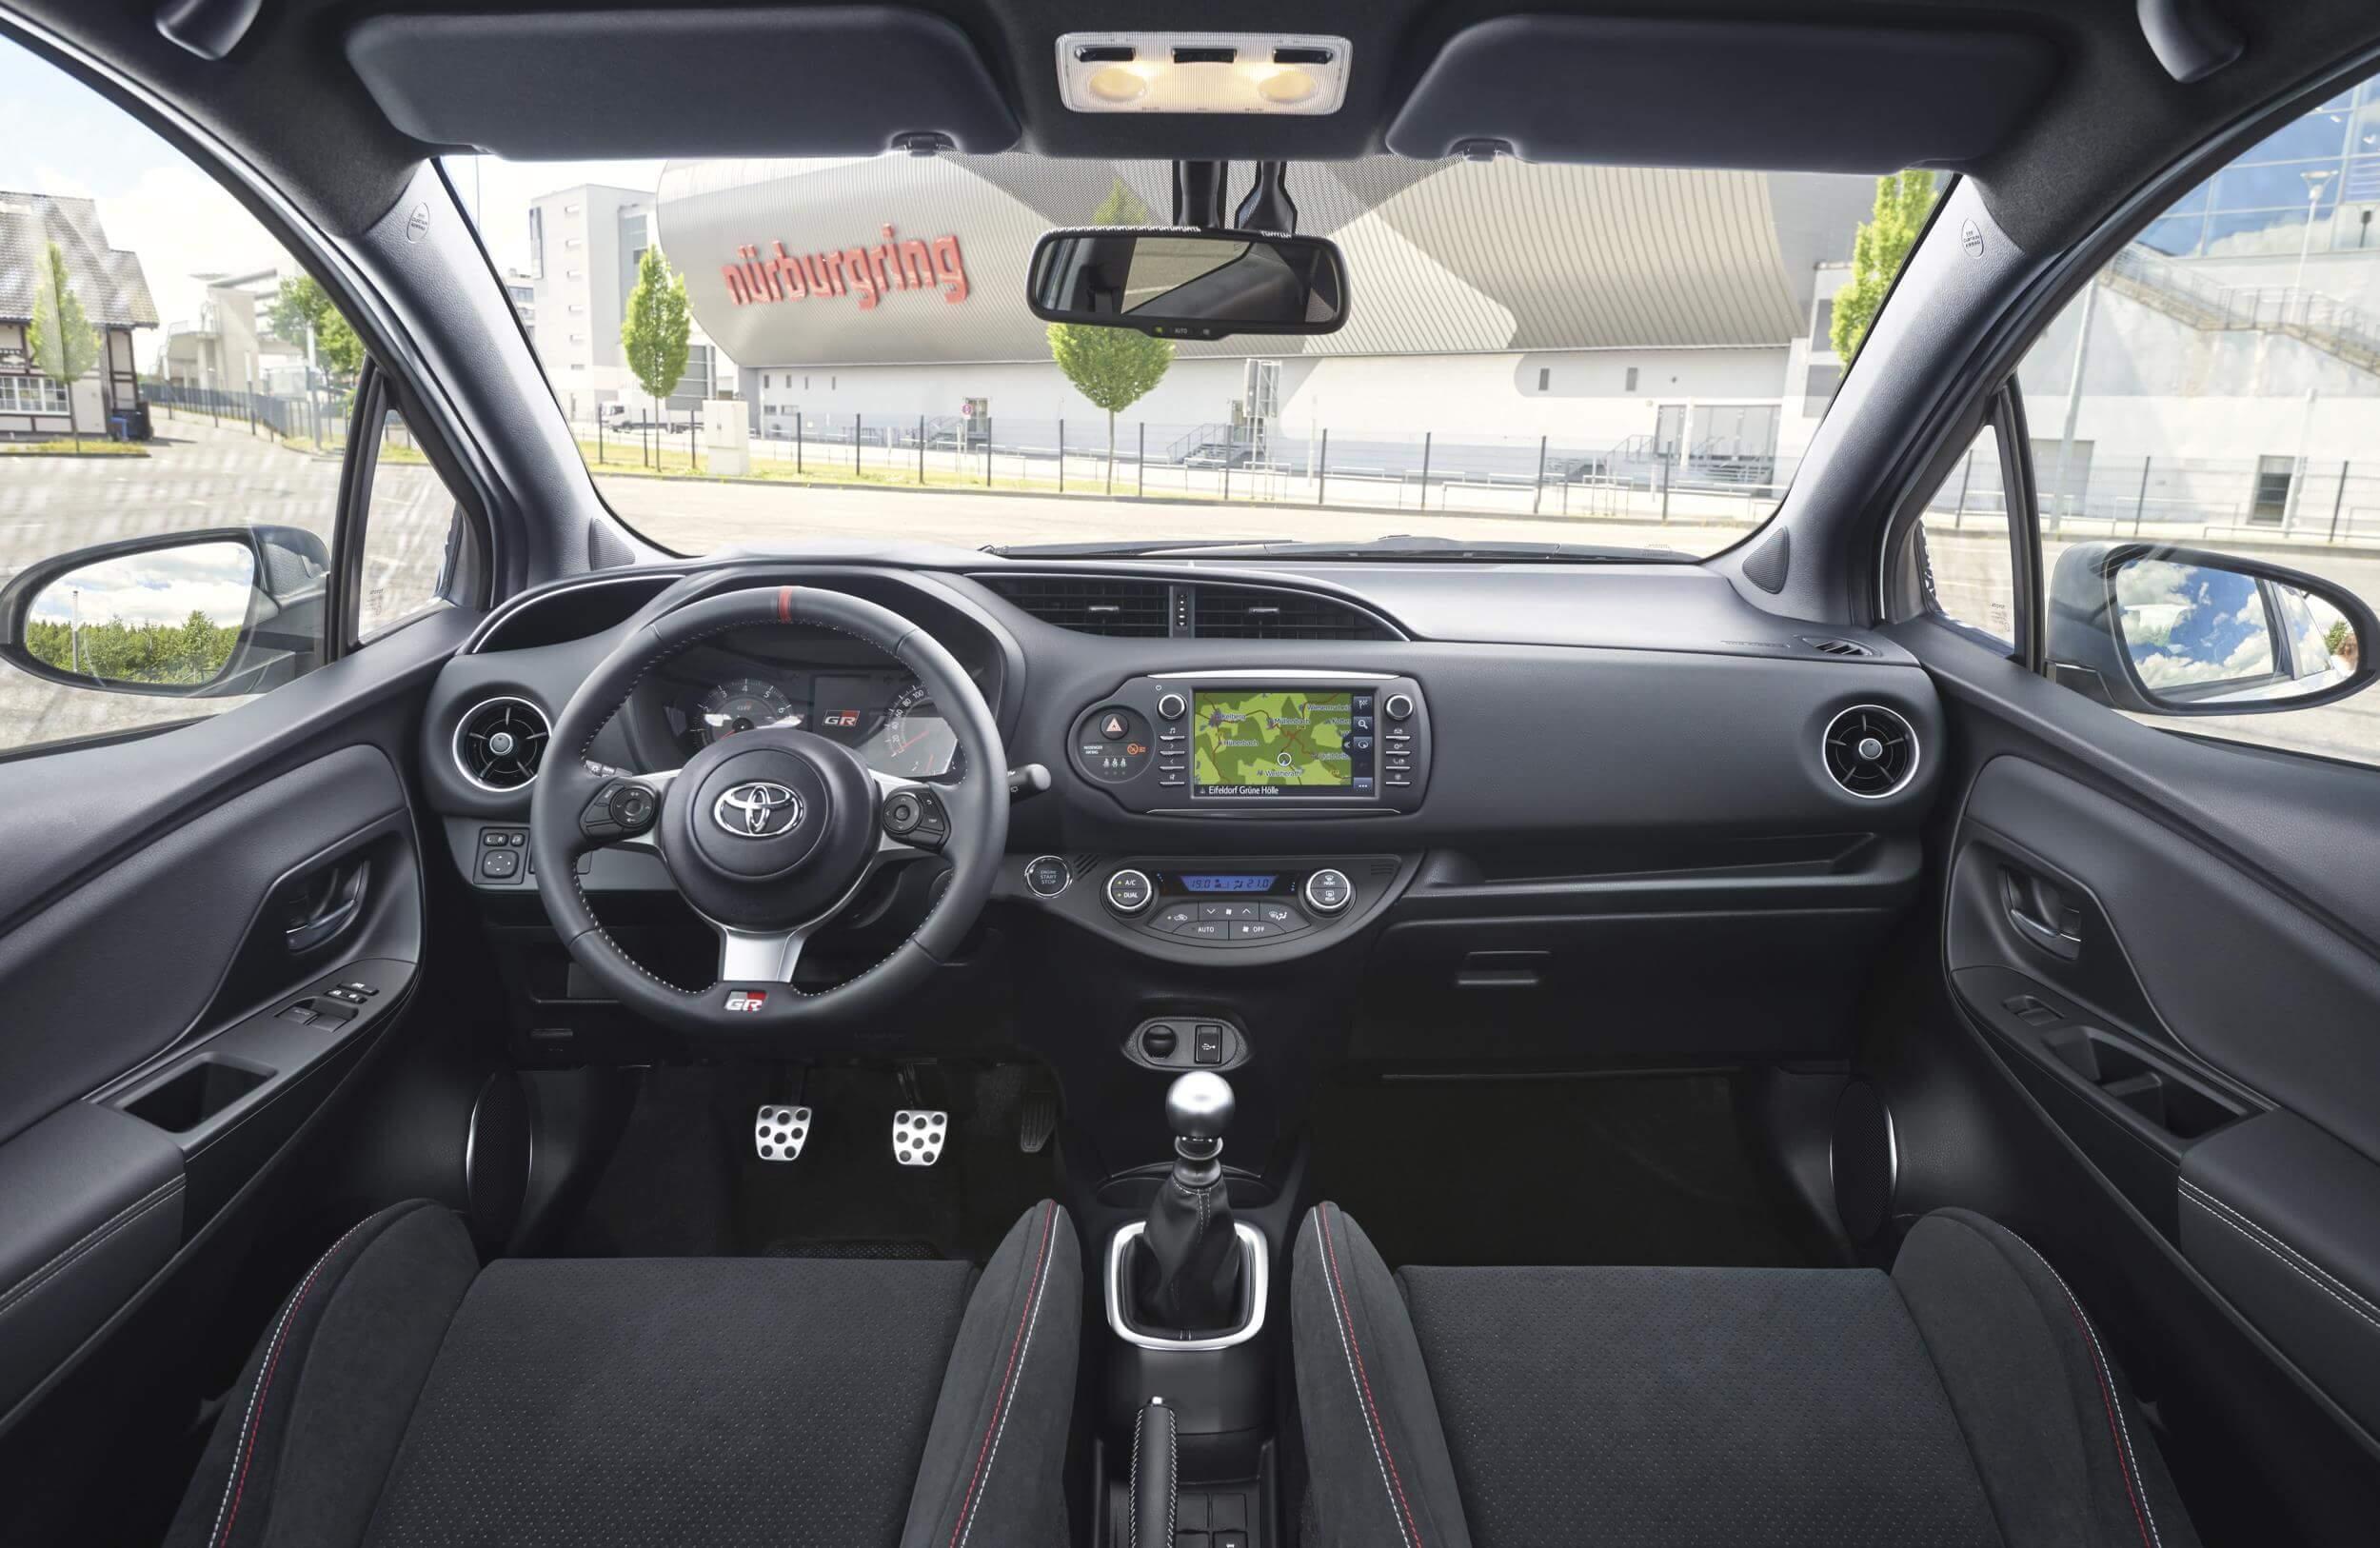 Toyota Yaris GRMN: interior